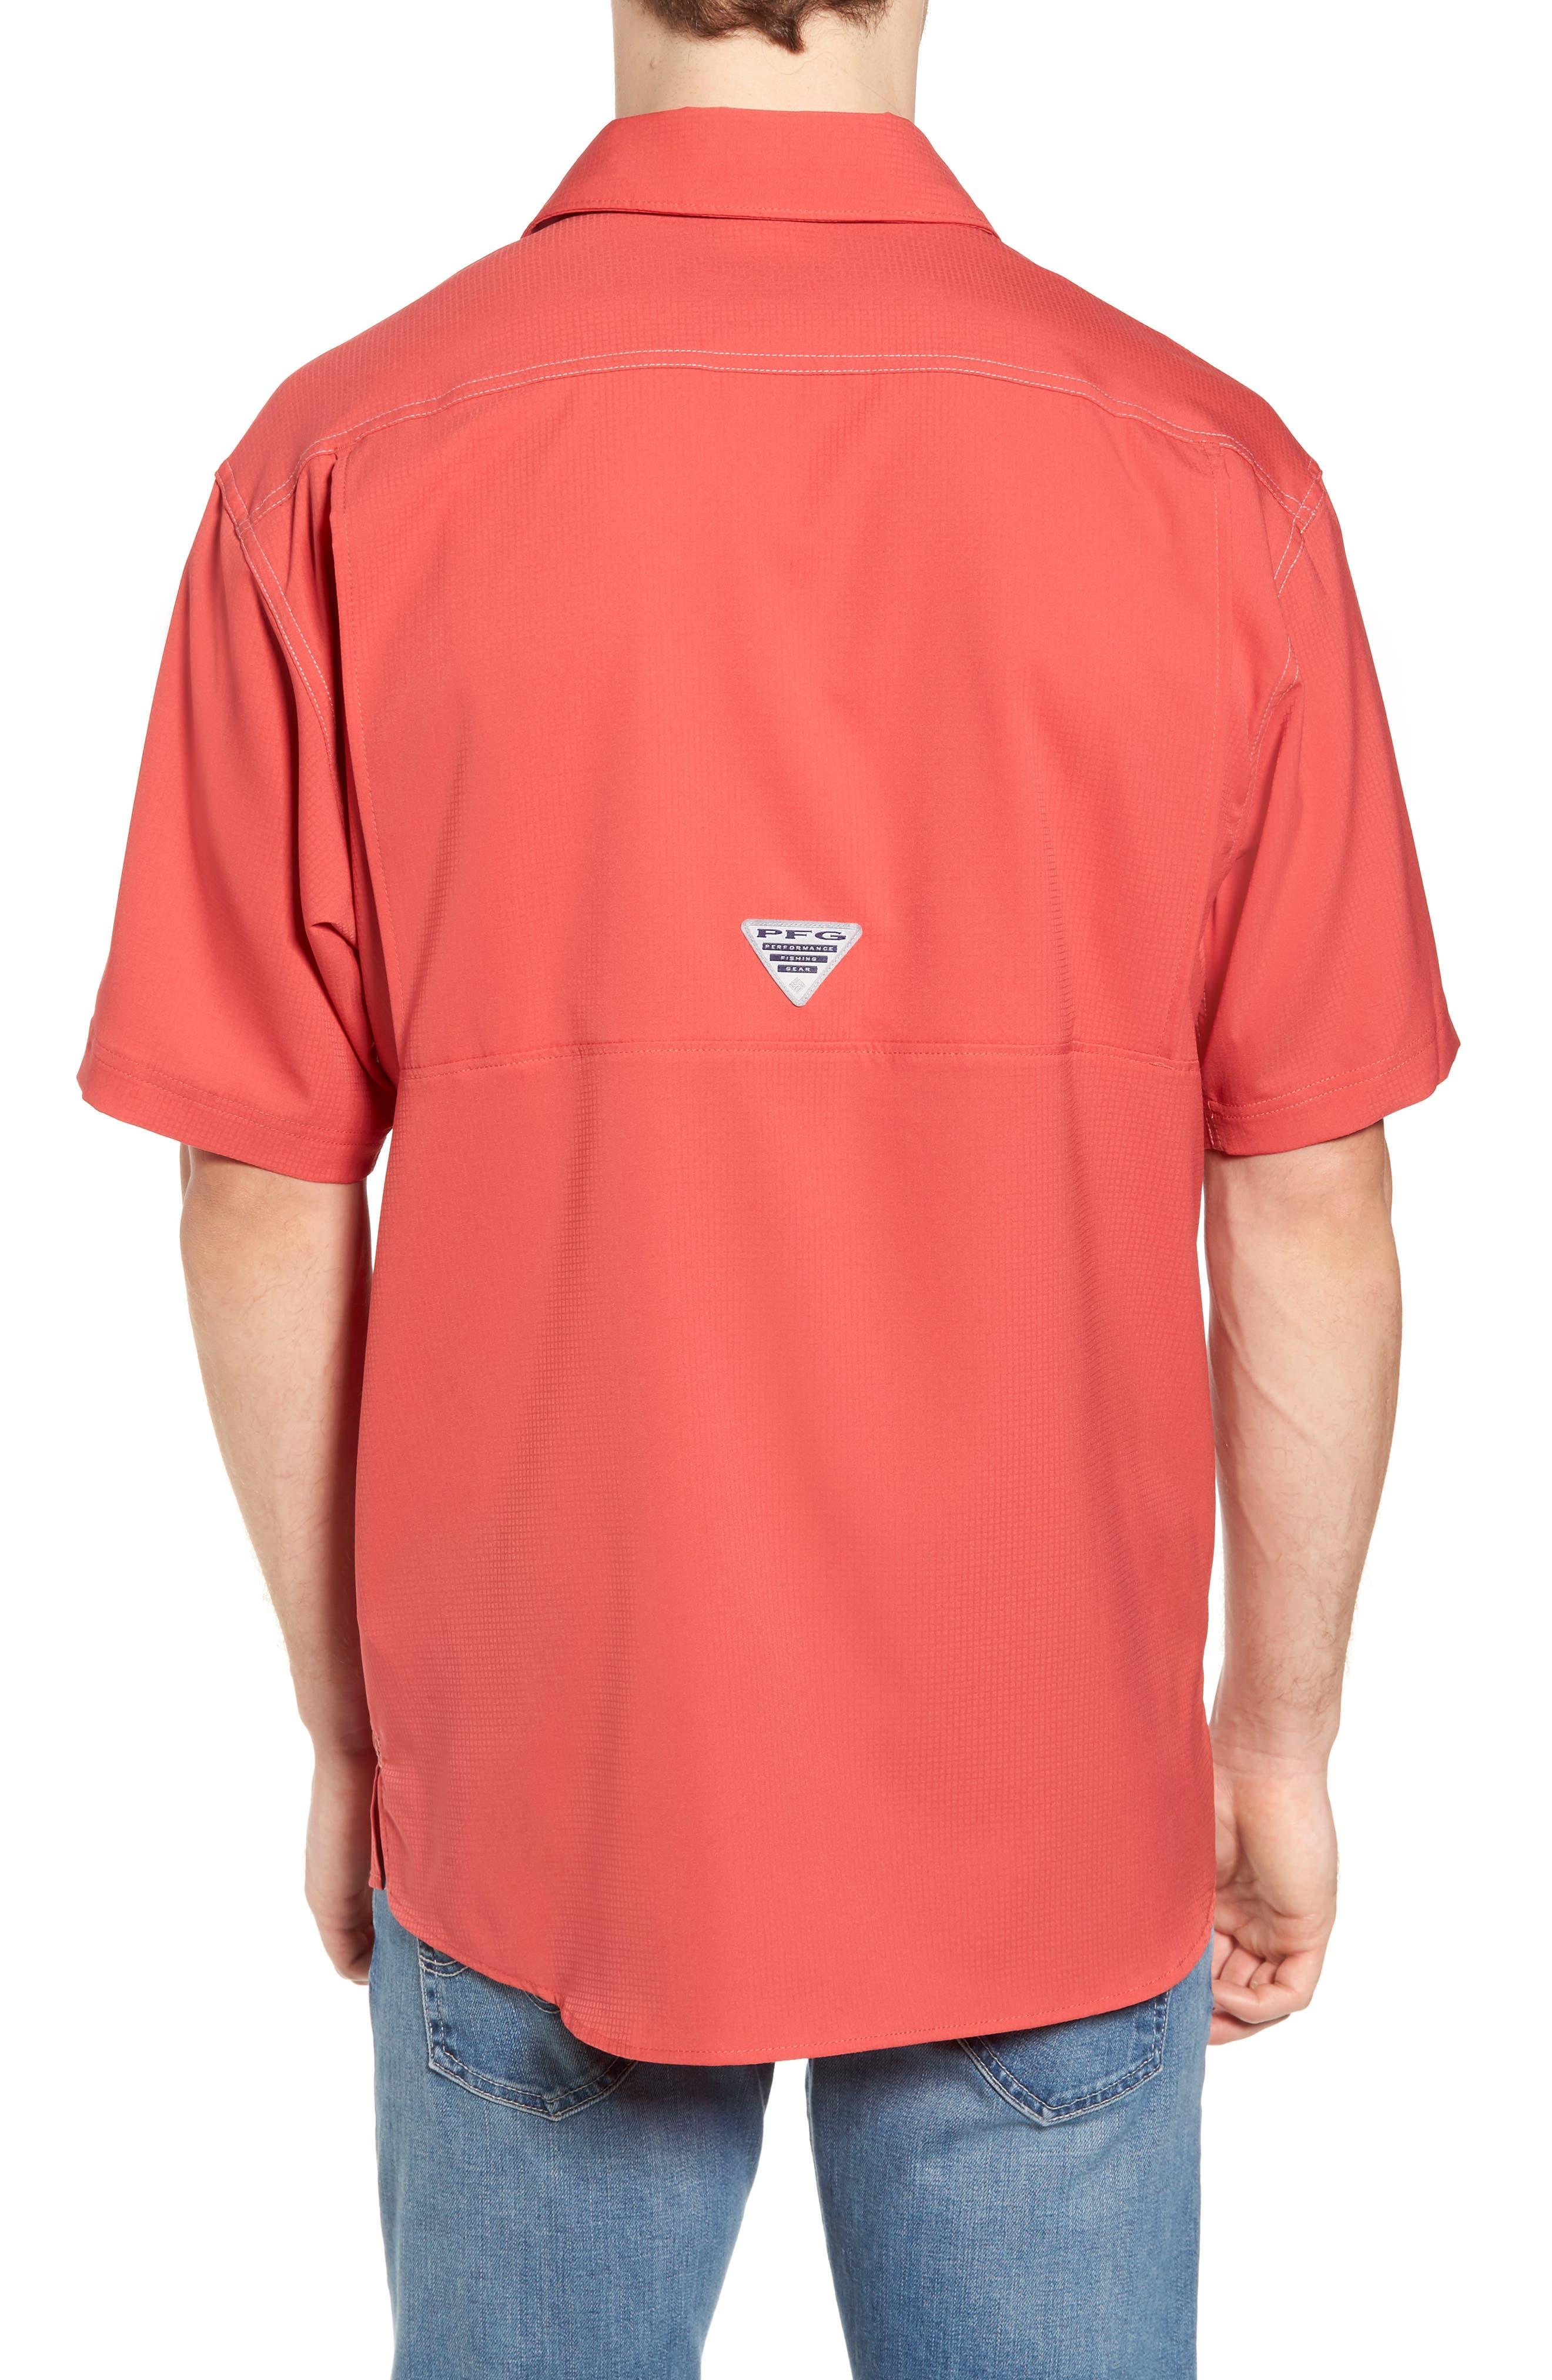 PFG Low Drag Offshore Woven Shirt,                             Alternate thumbnail 9, color,